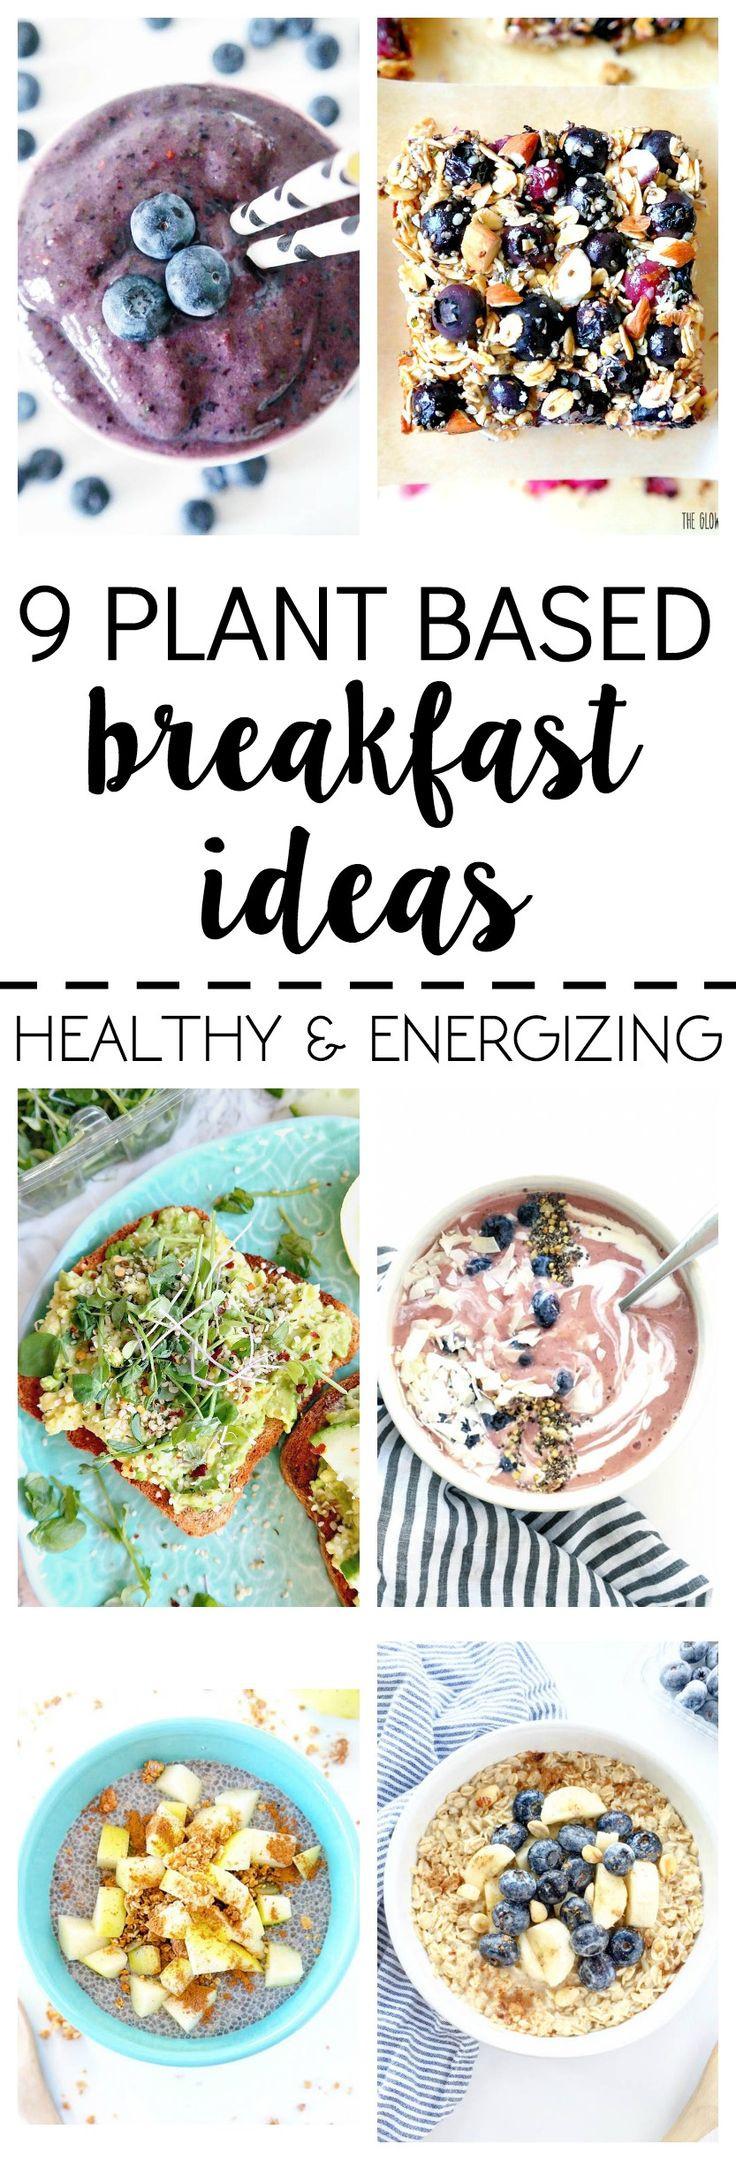 Plant Based Breakfast Recipes  What I Ate 9 Plant Based Breakfast Ideas All Vegan